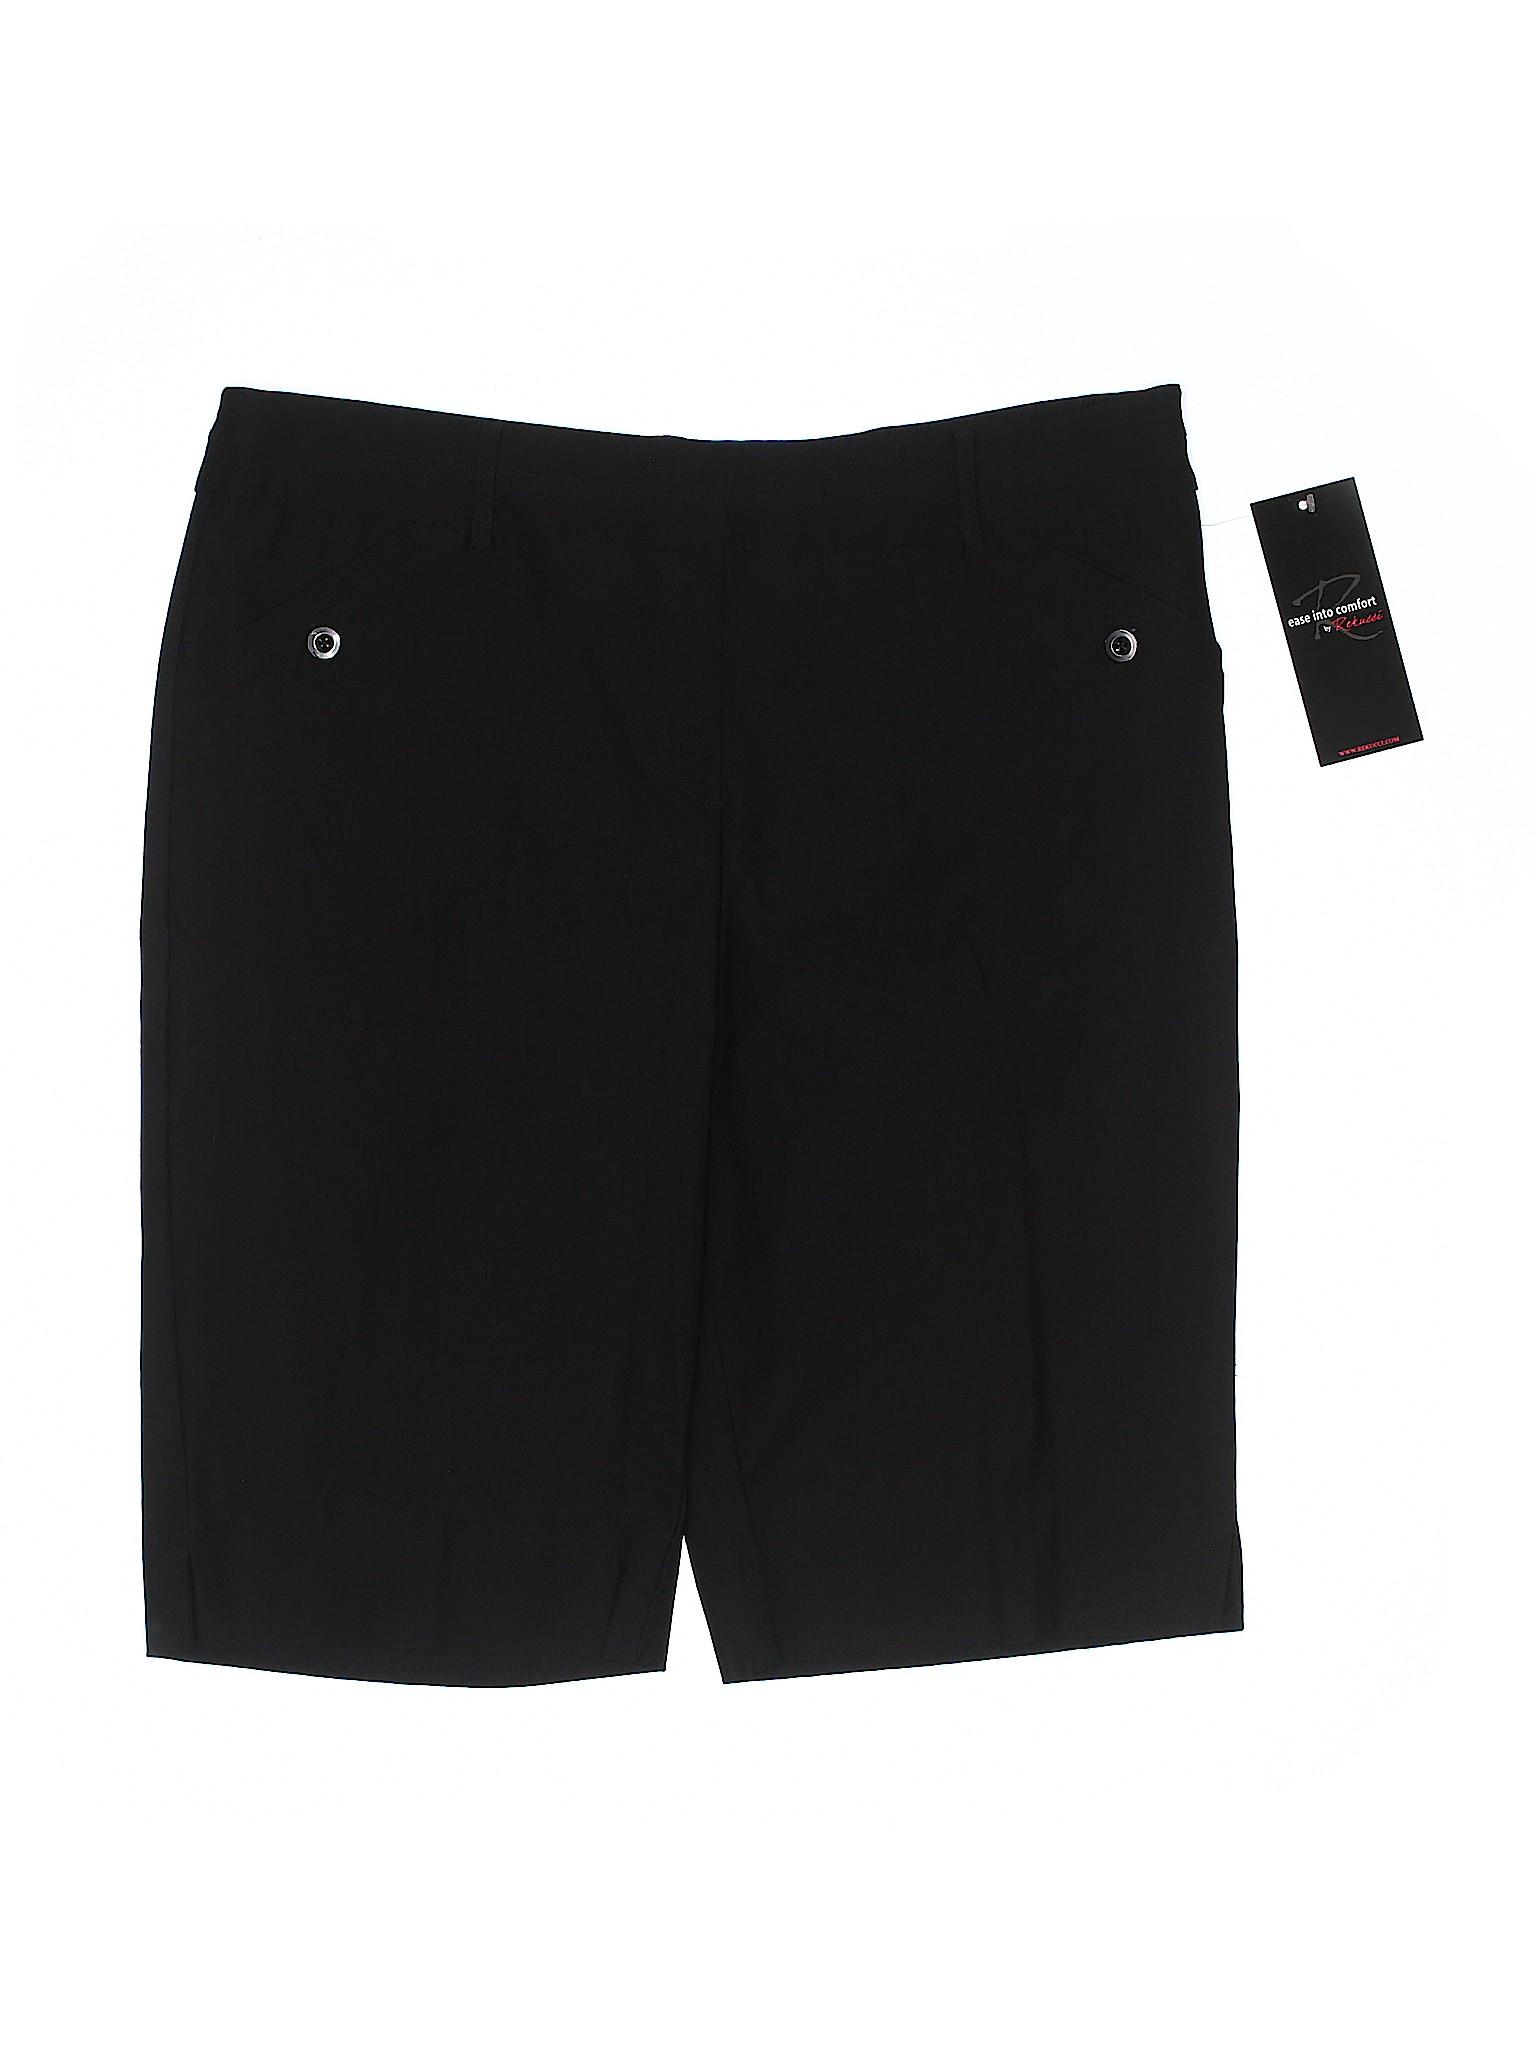 Boutique Boutique Rekucci Shorts Shorts Rekucci Boutique Dressy Dressy 81qFw